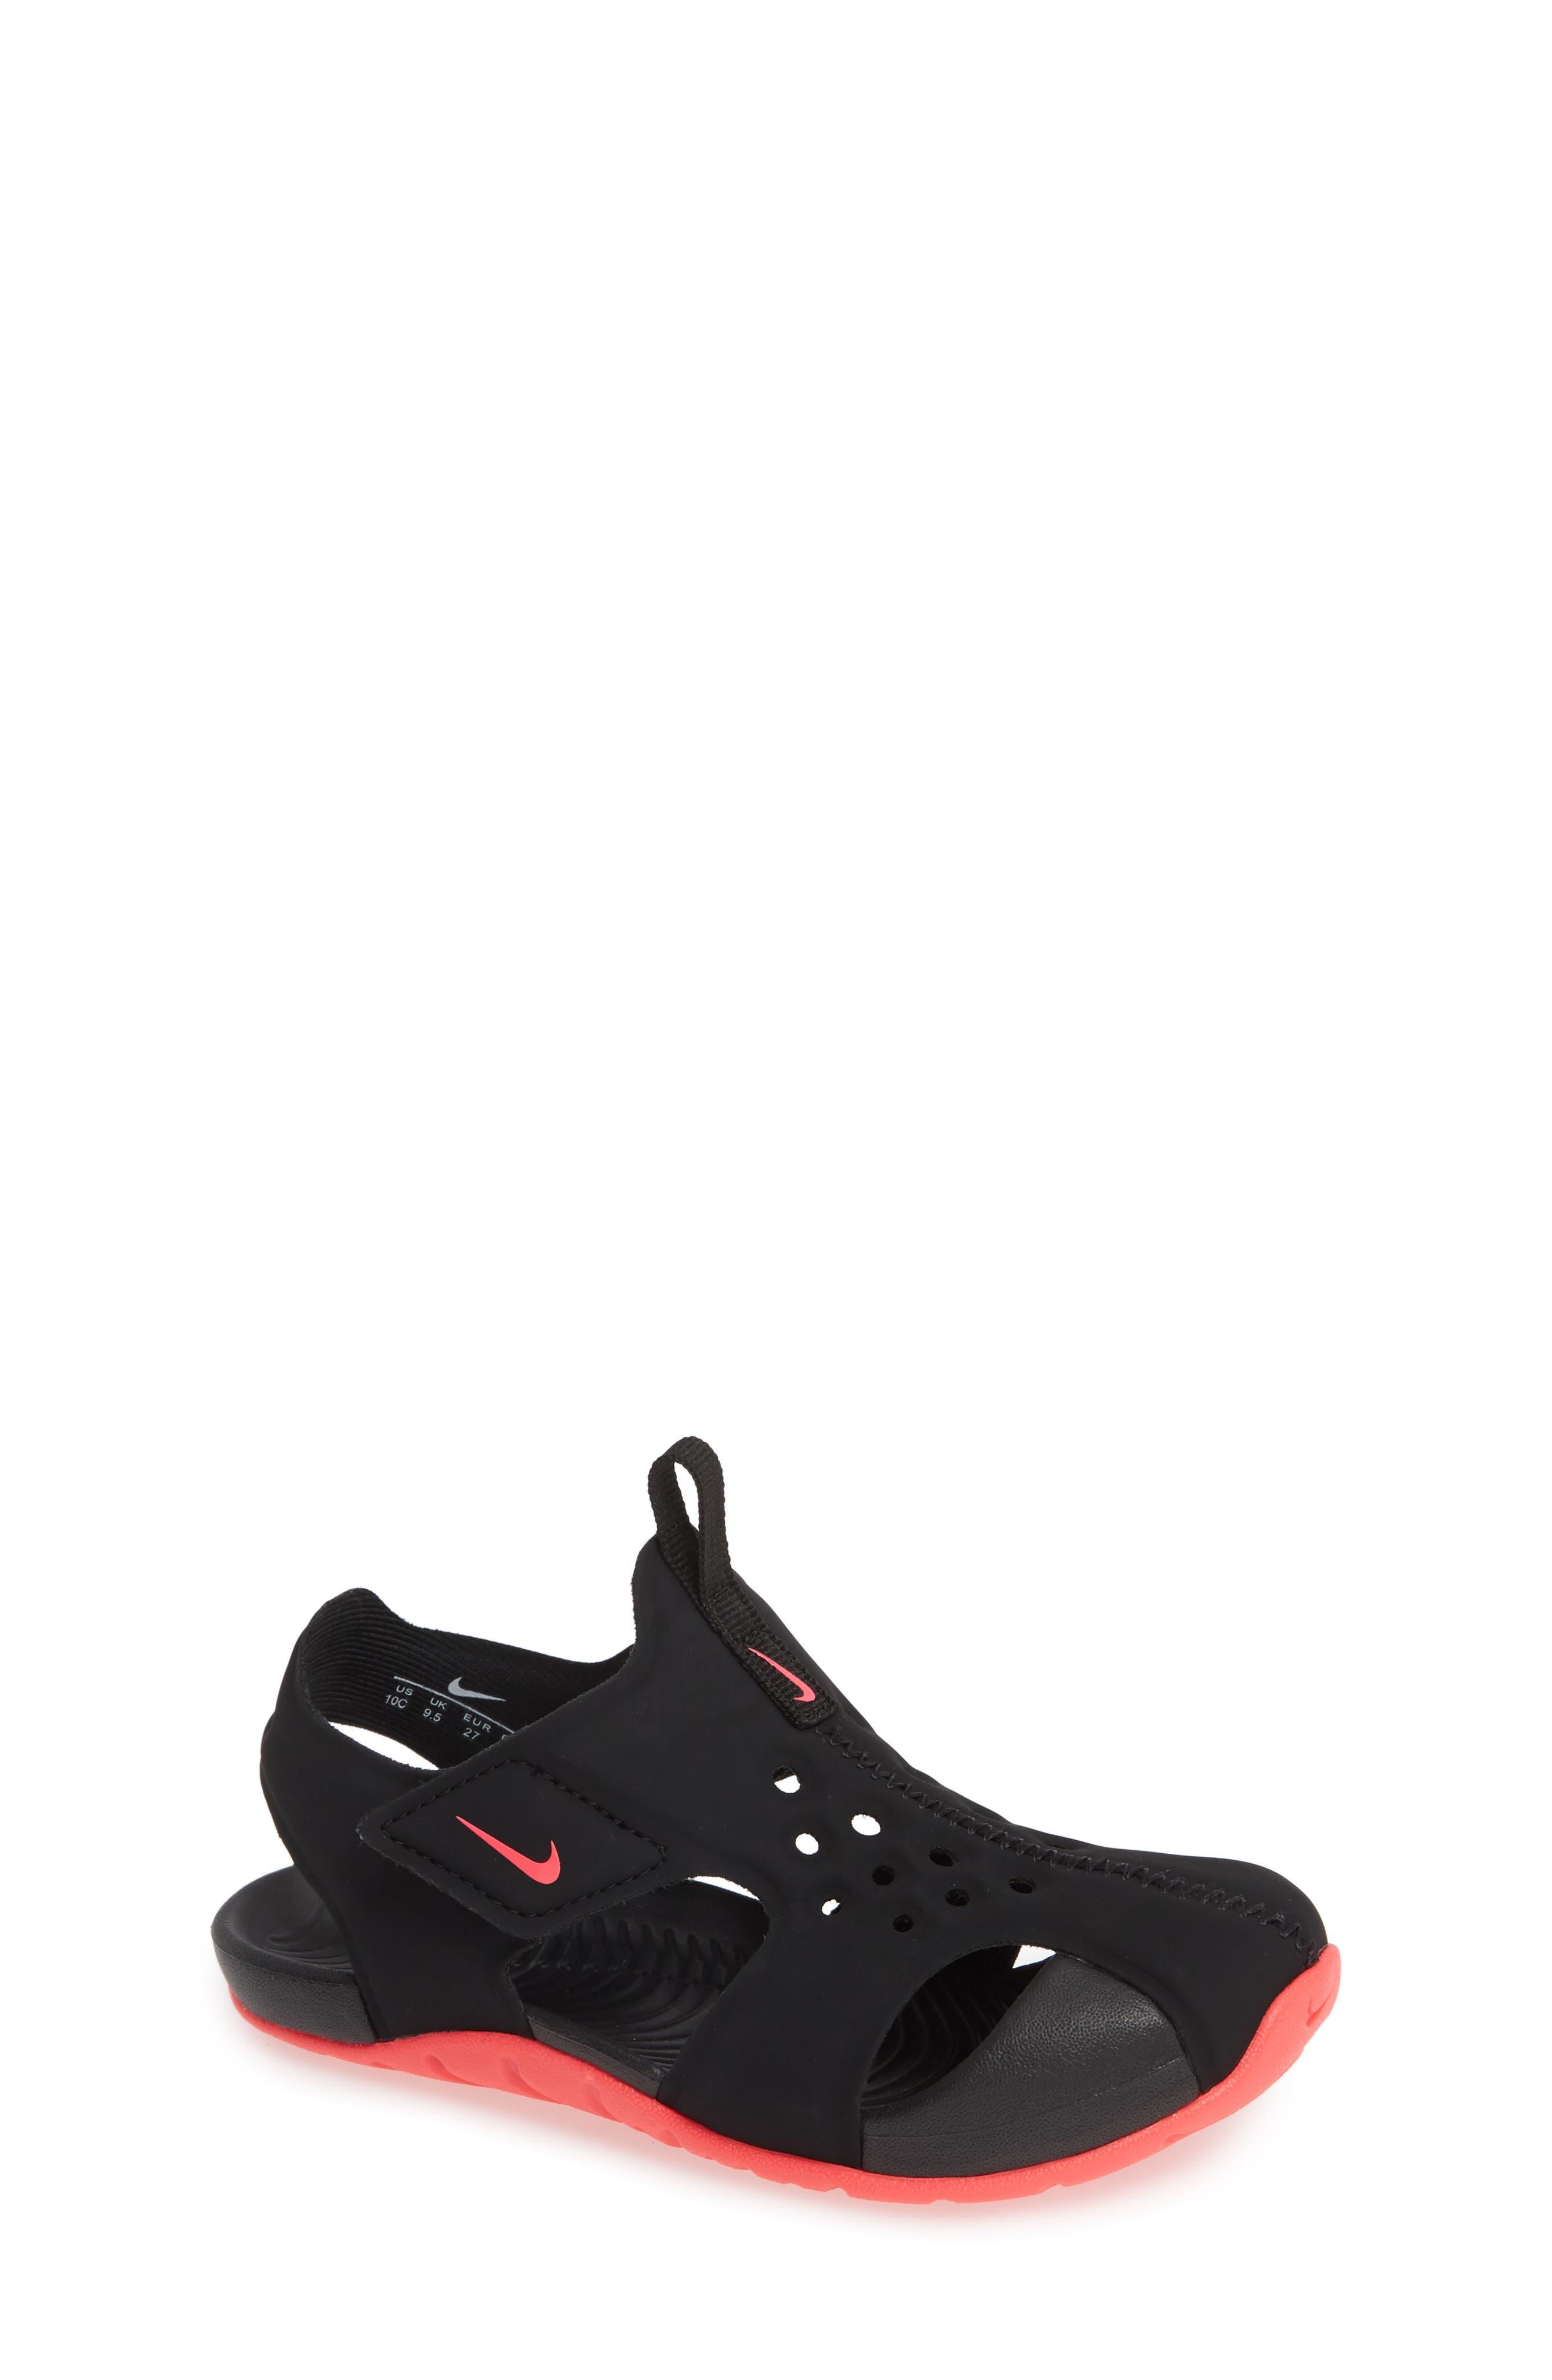 NIKE Sunray Protect 2 Sandal, Main, color, BLACK/ RACER PINK